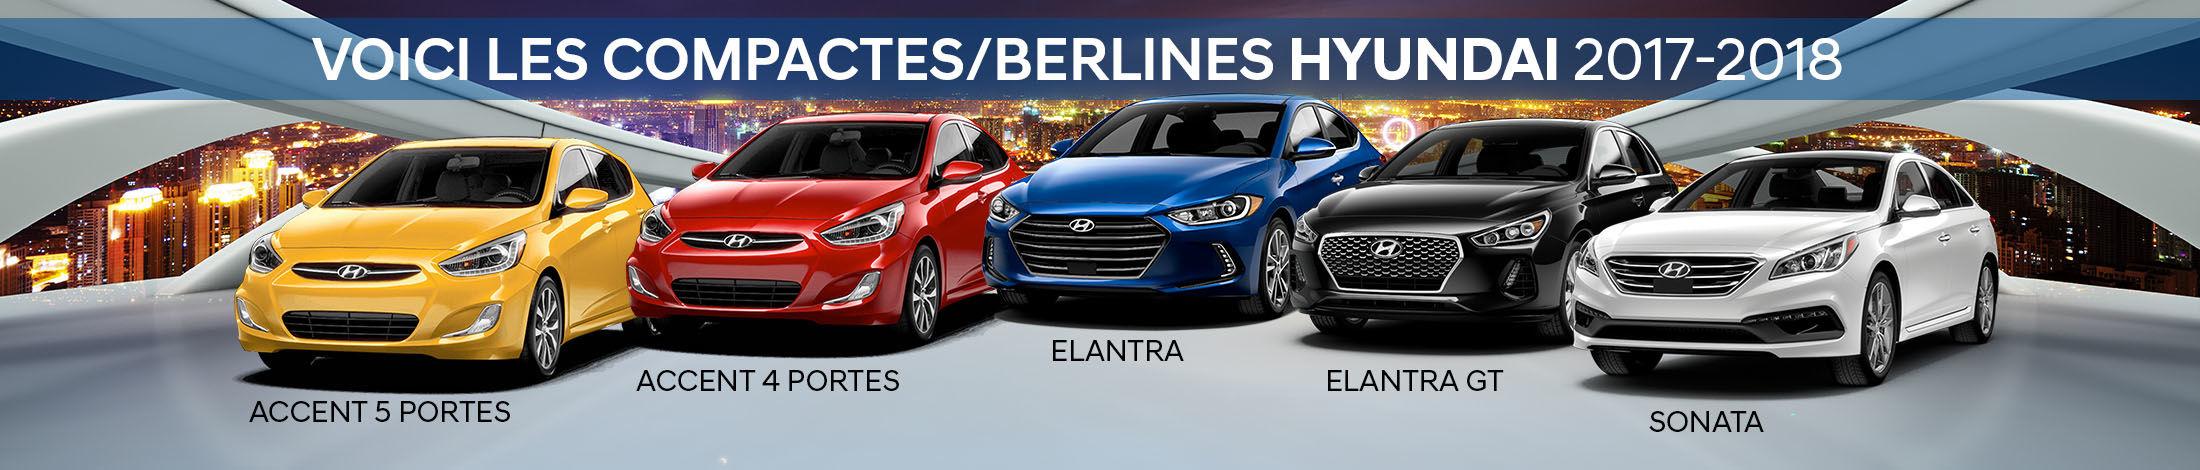 Compactes/Berlines Hyundai 2017-2018